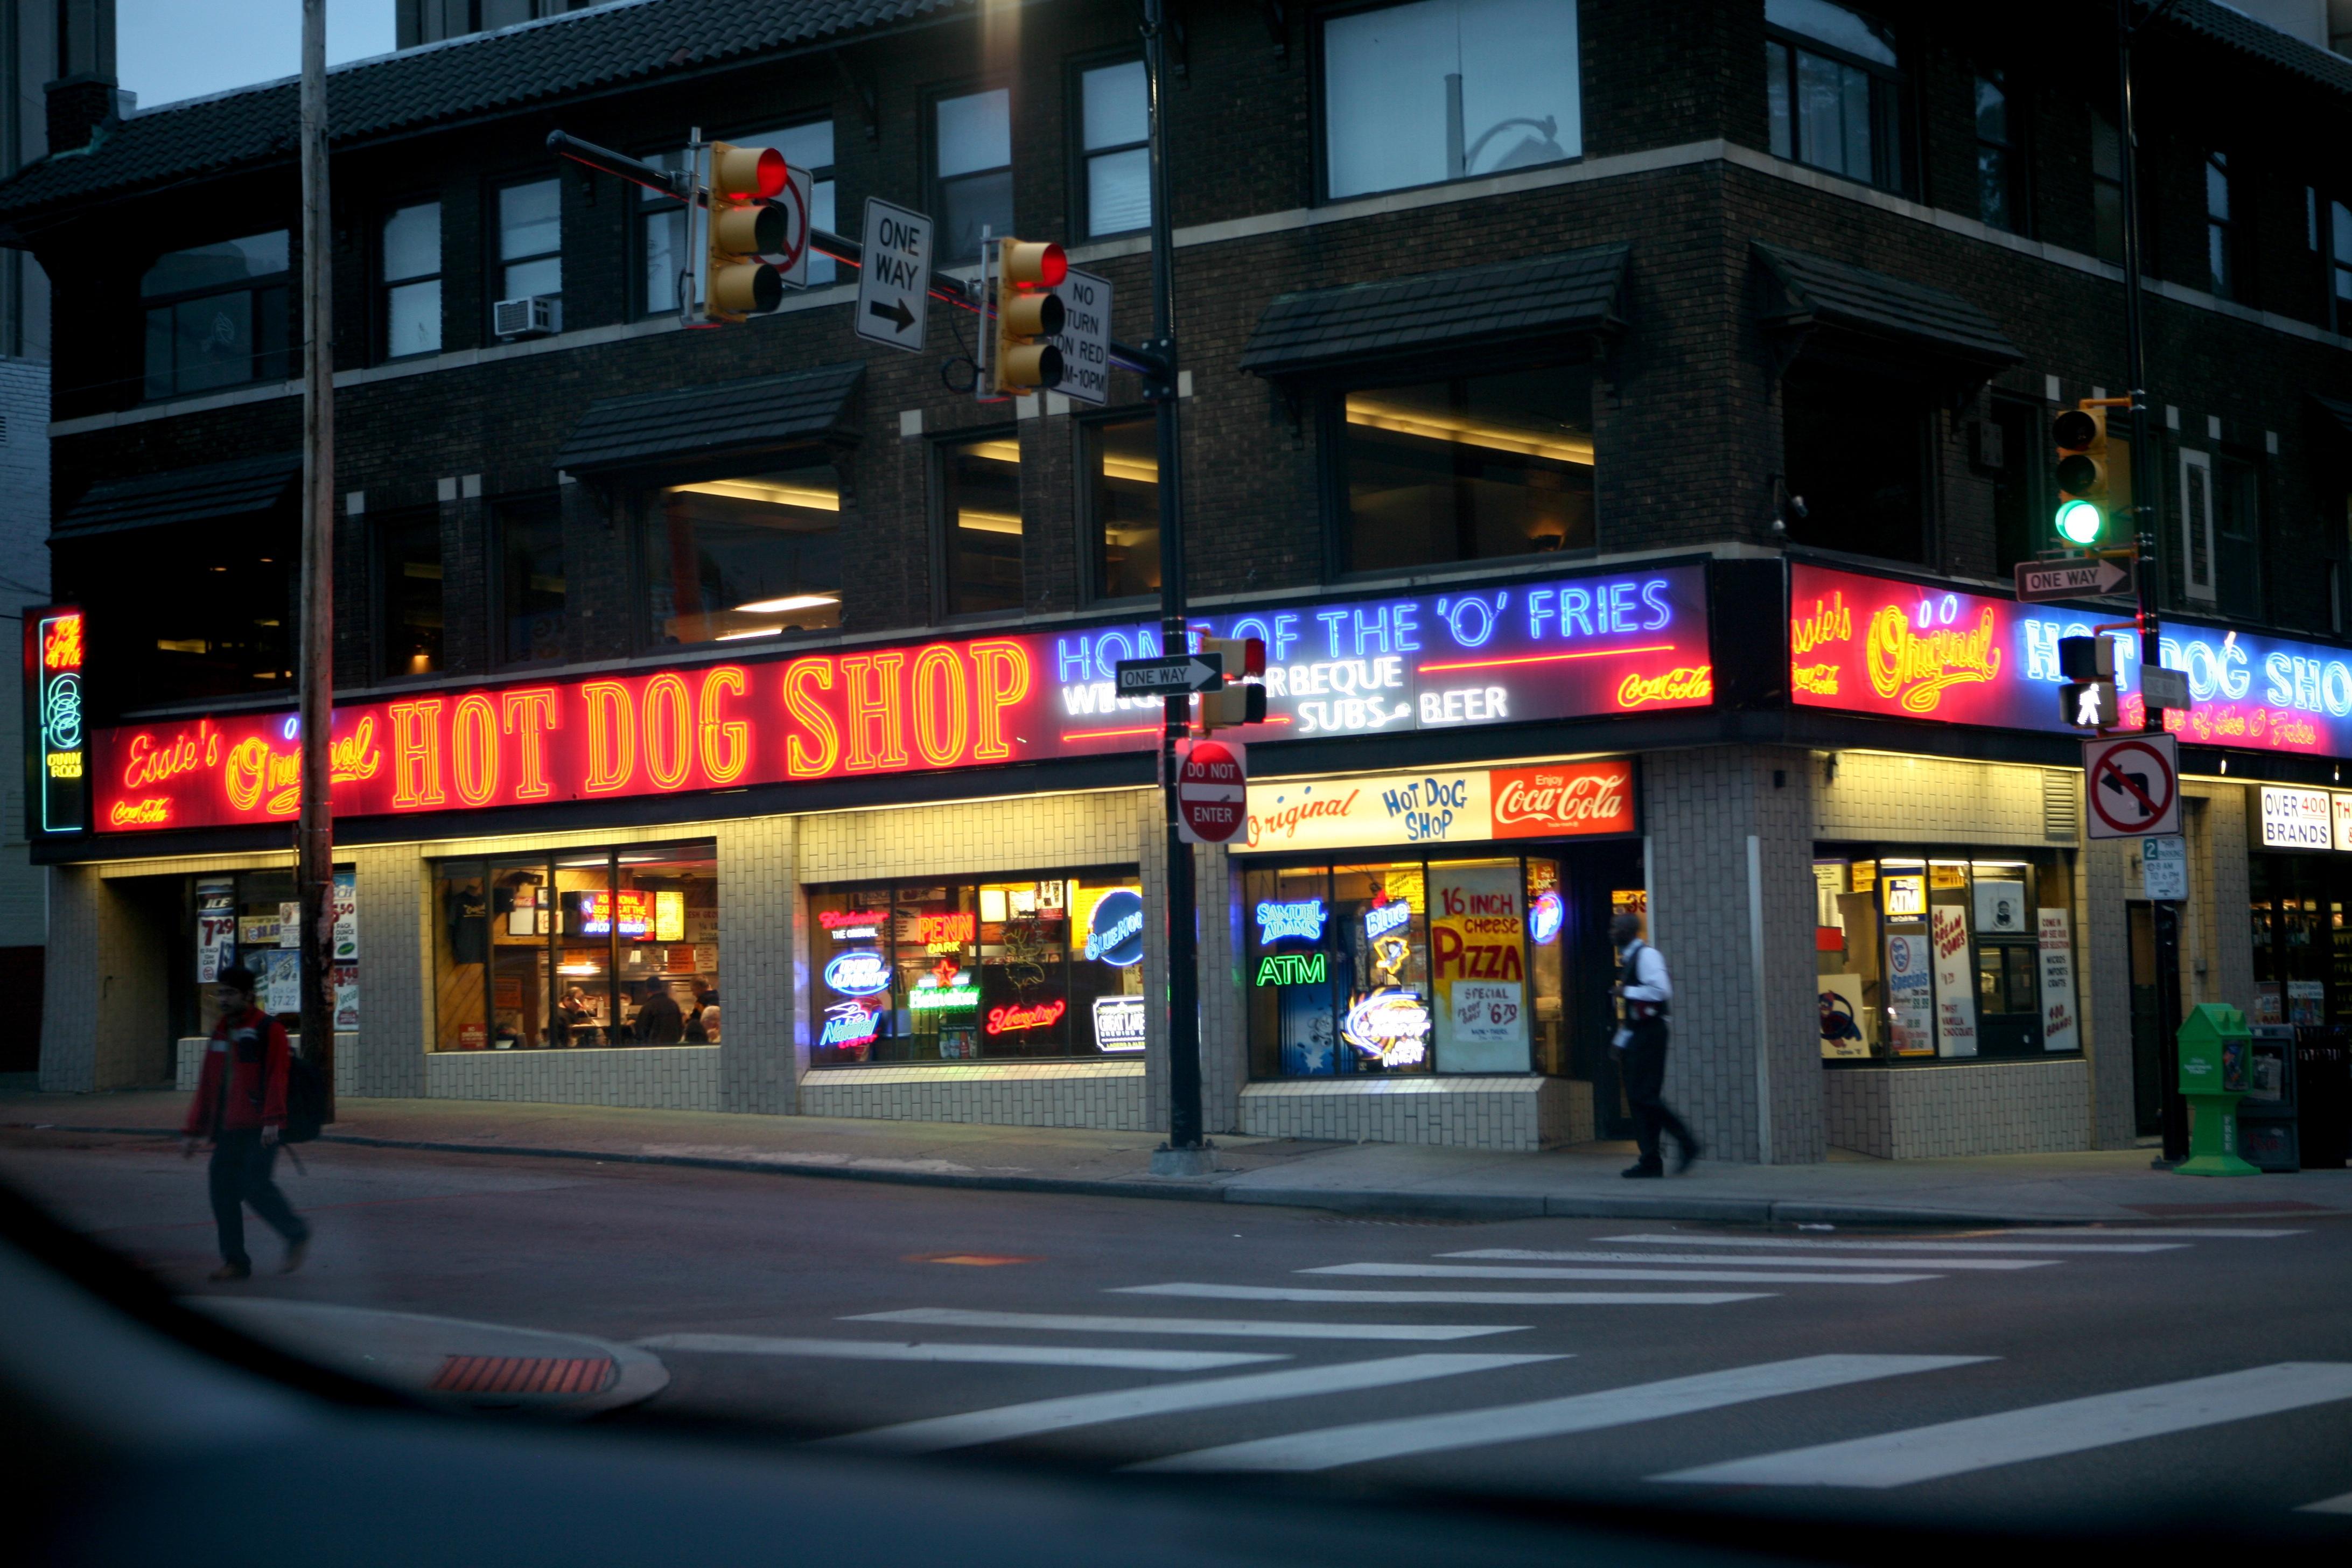 essie s original hot dog shop since 1960 ruth e hendricks photography. Black Bedroom Furniture Sets. Home Design Ideas